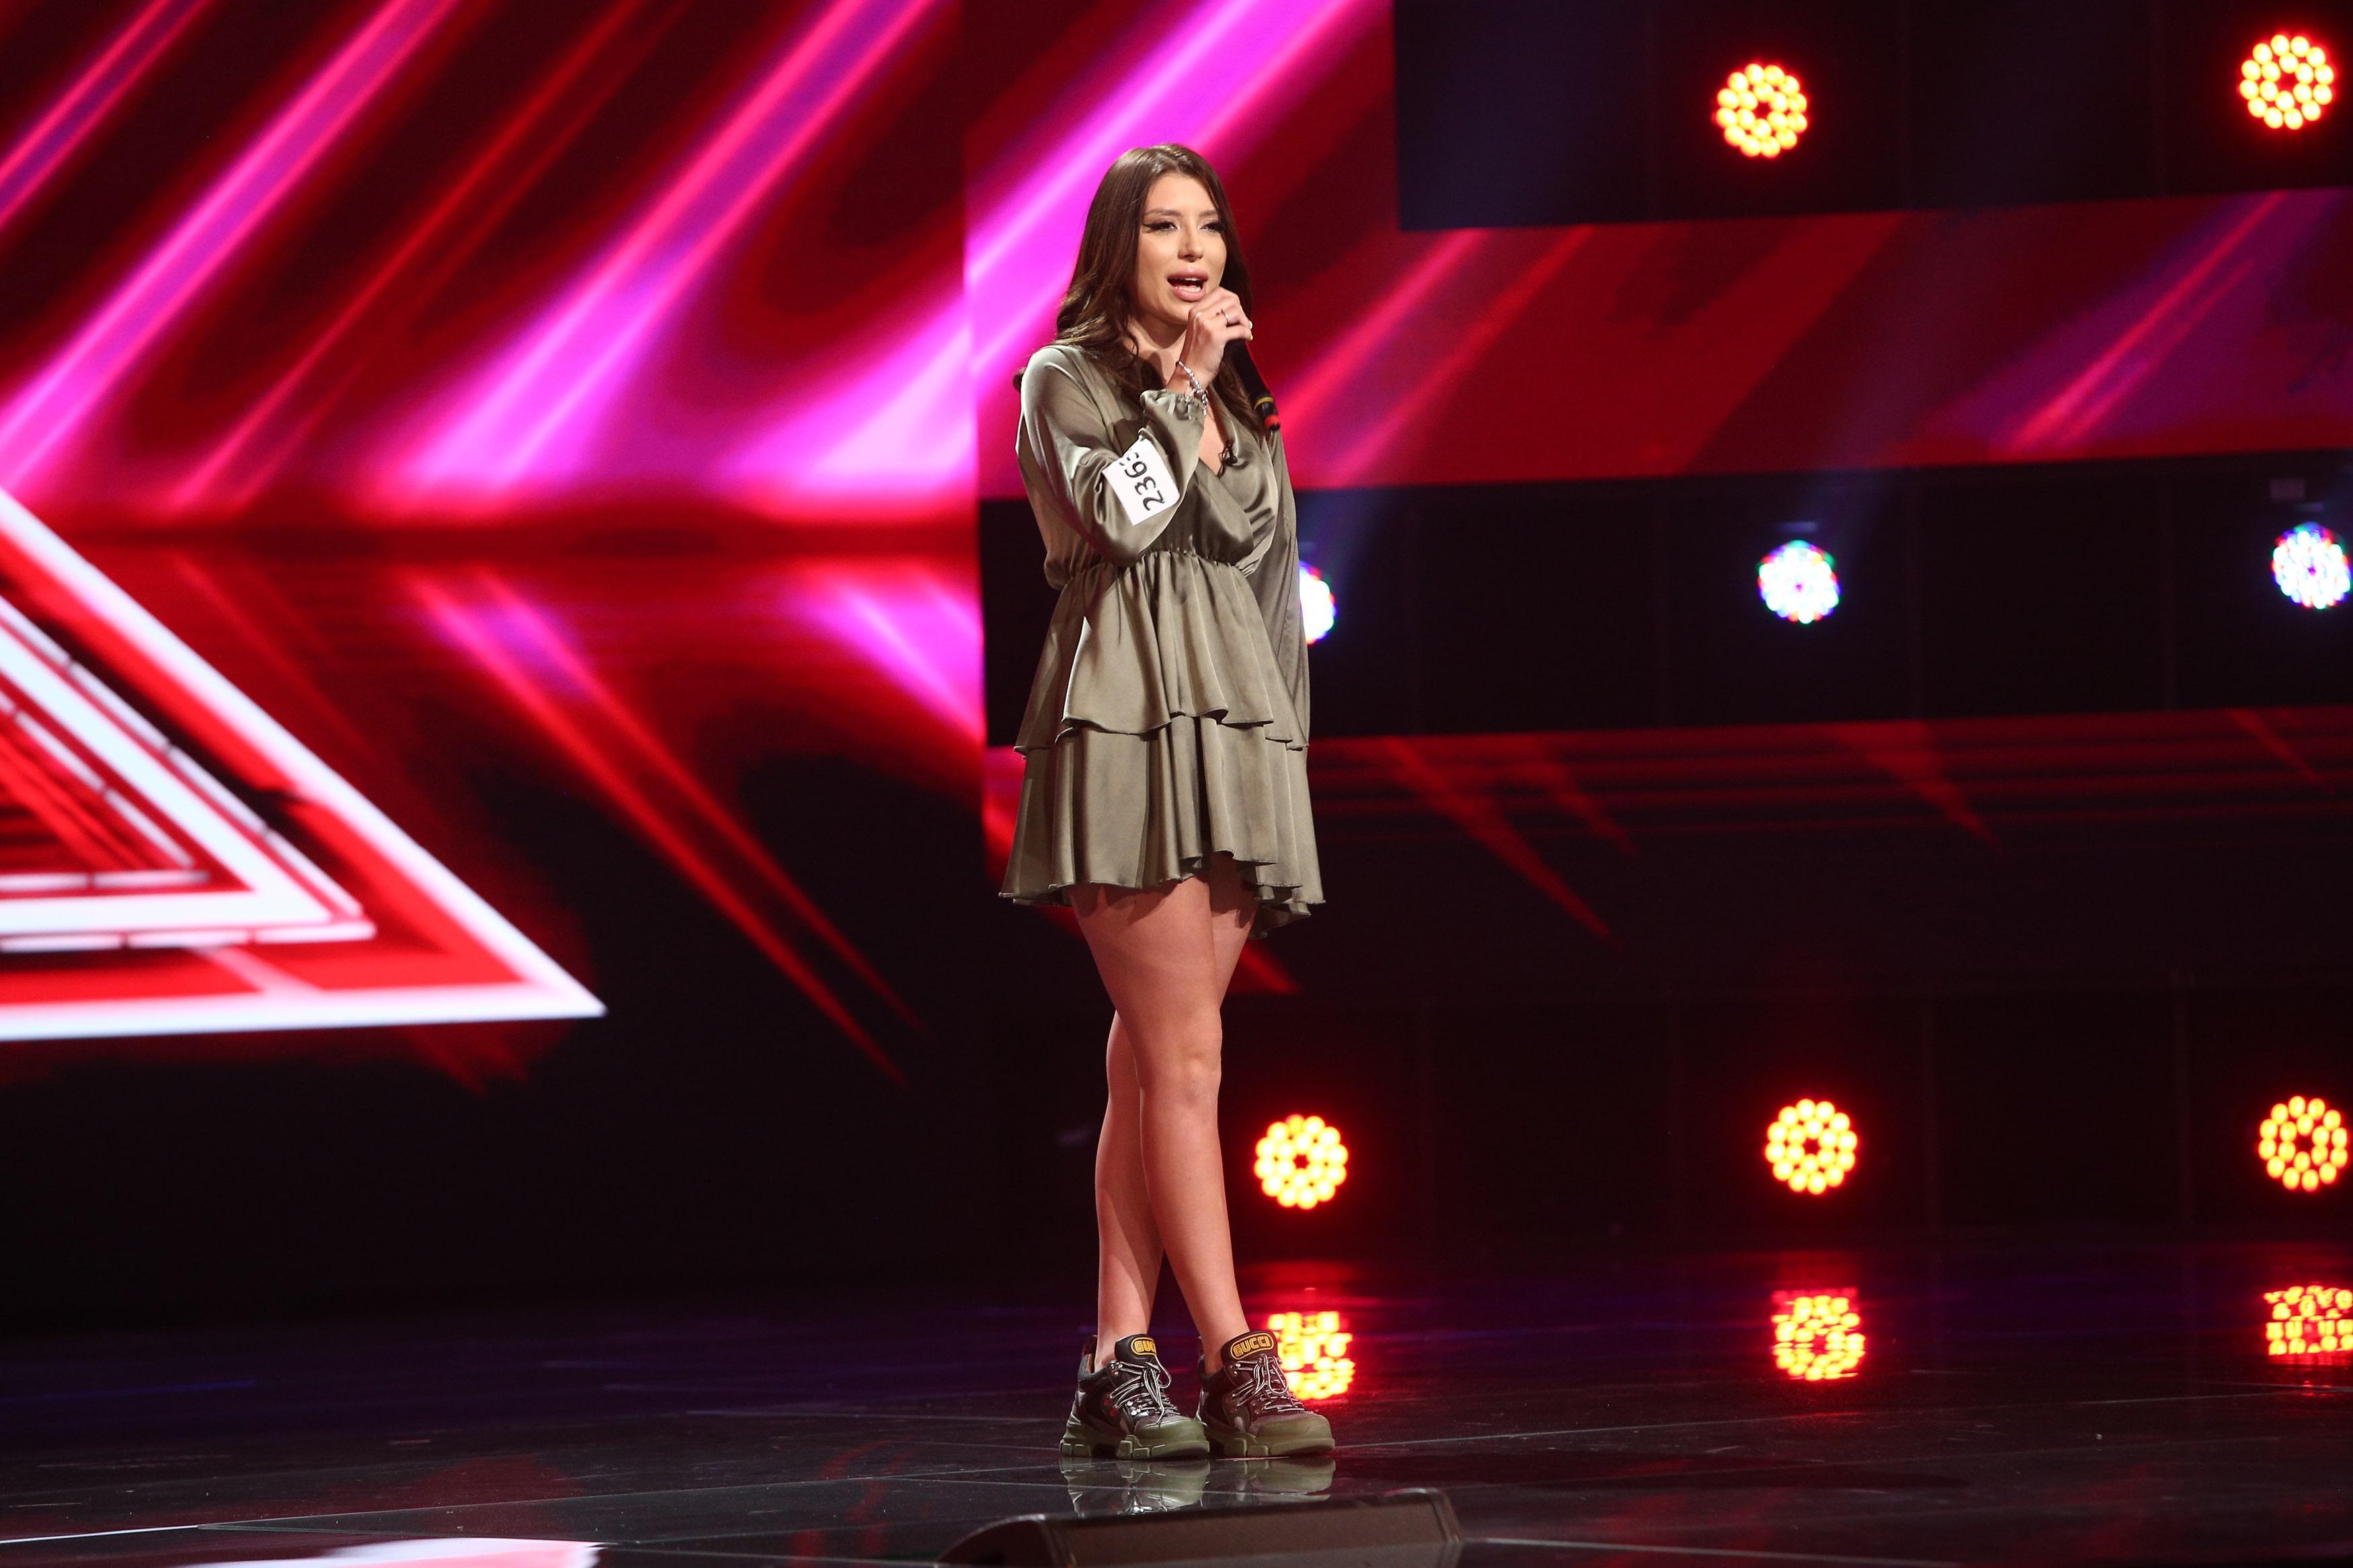 X Factor 2021, 10 septembrie. Rebeca Drăgan a impresionat cu prestația ei după ce a cântat piesa I don't wanna to be you anymore